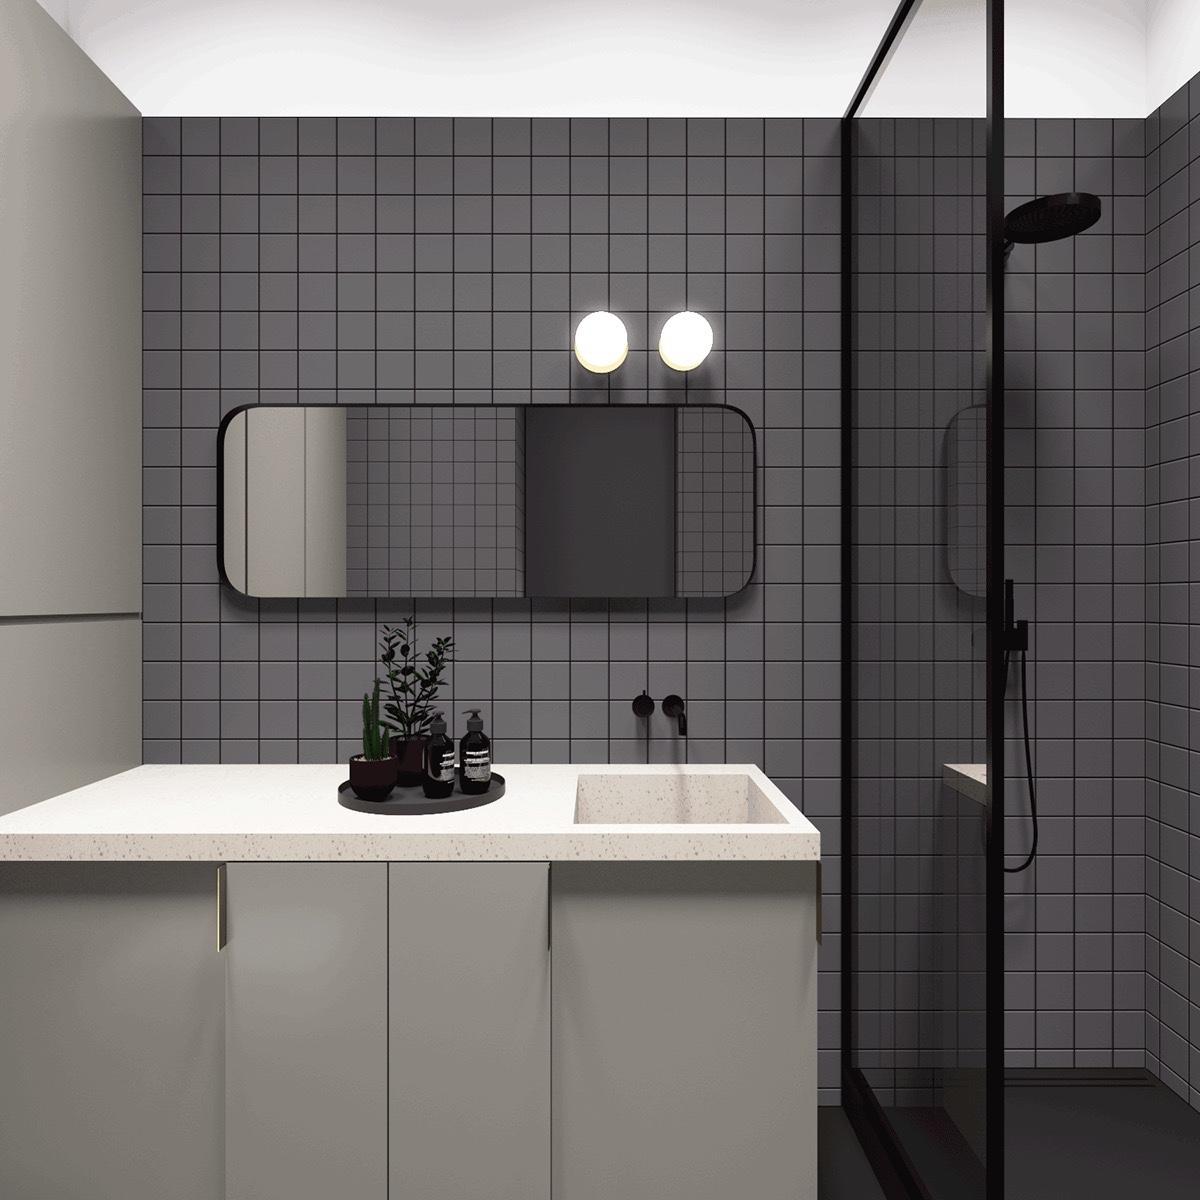 600 Square Feet Apartment Design With Wonderful Maximalist ... on Apartment Bathroom Ideas  id=71583